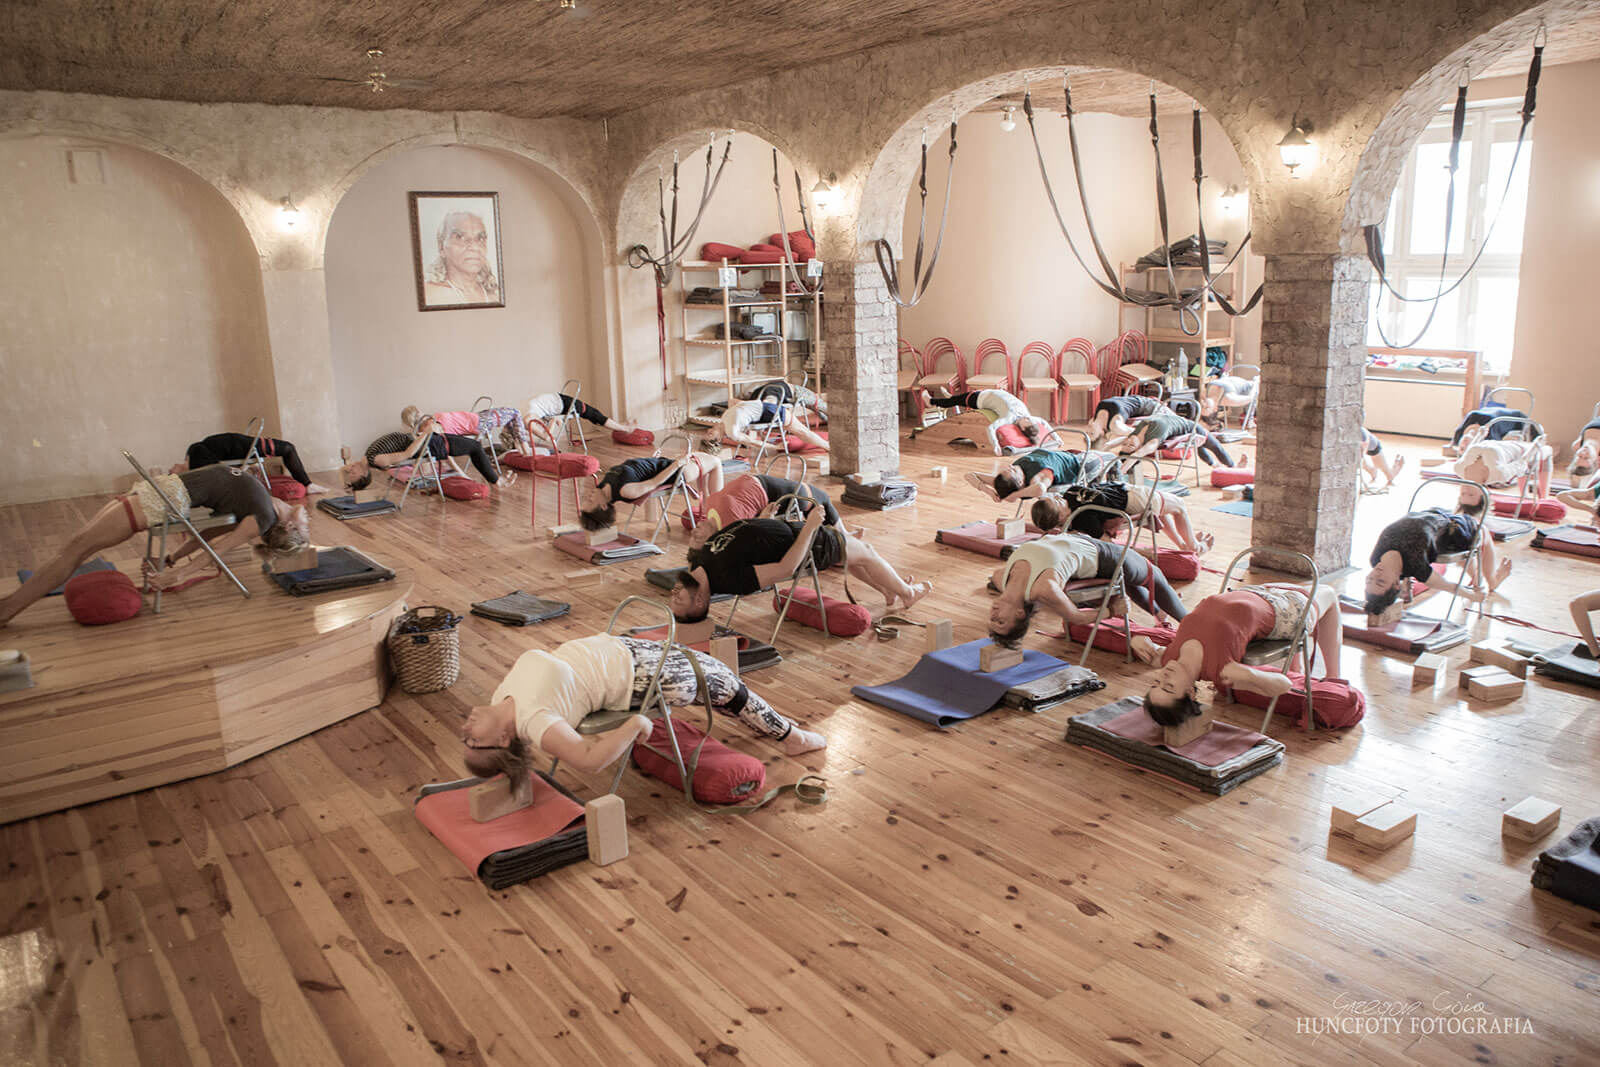 Zajecia jogi - grupa Grupa zaawansowana (zajęcia do 20:30)